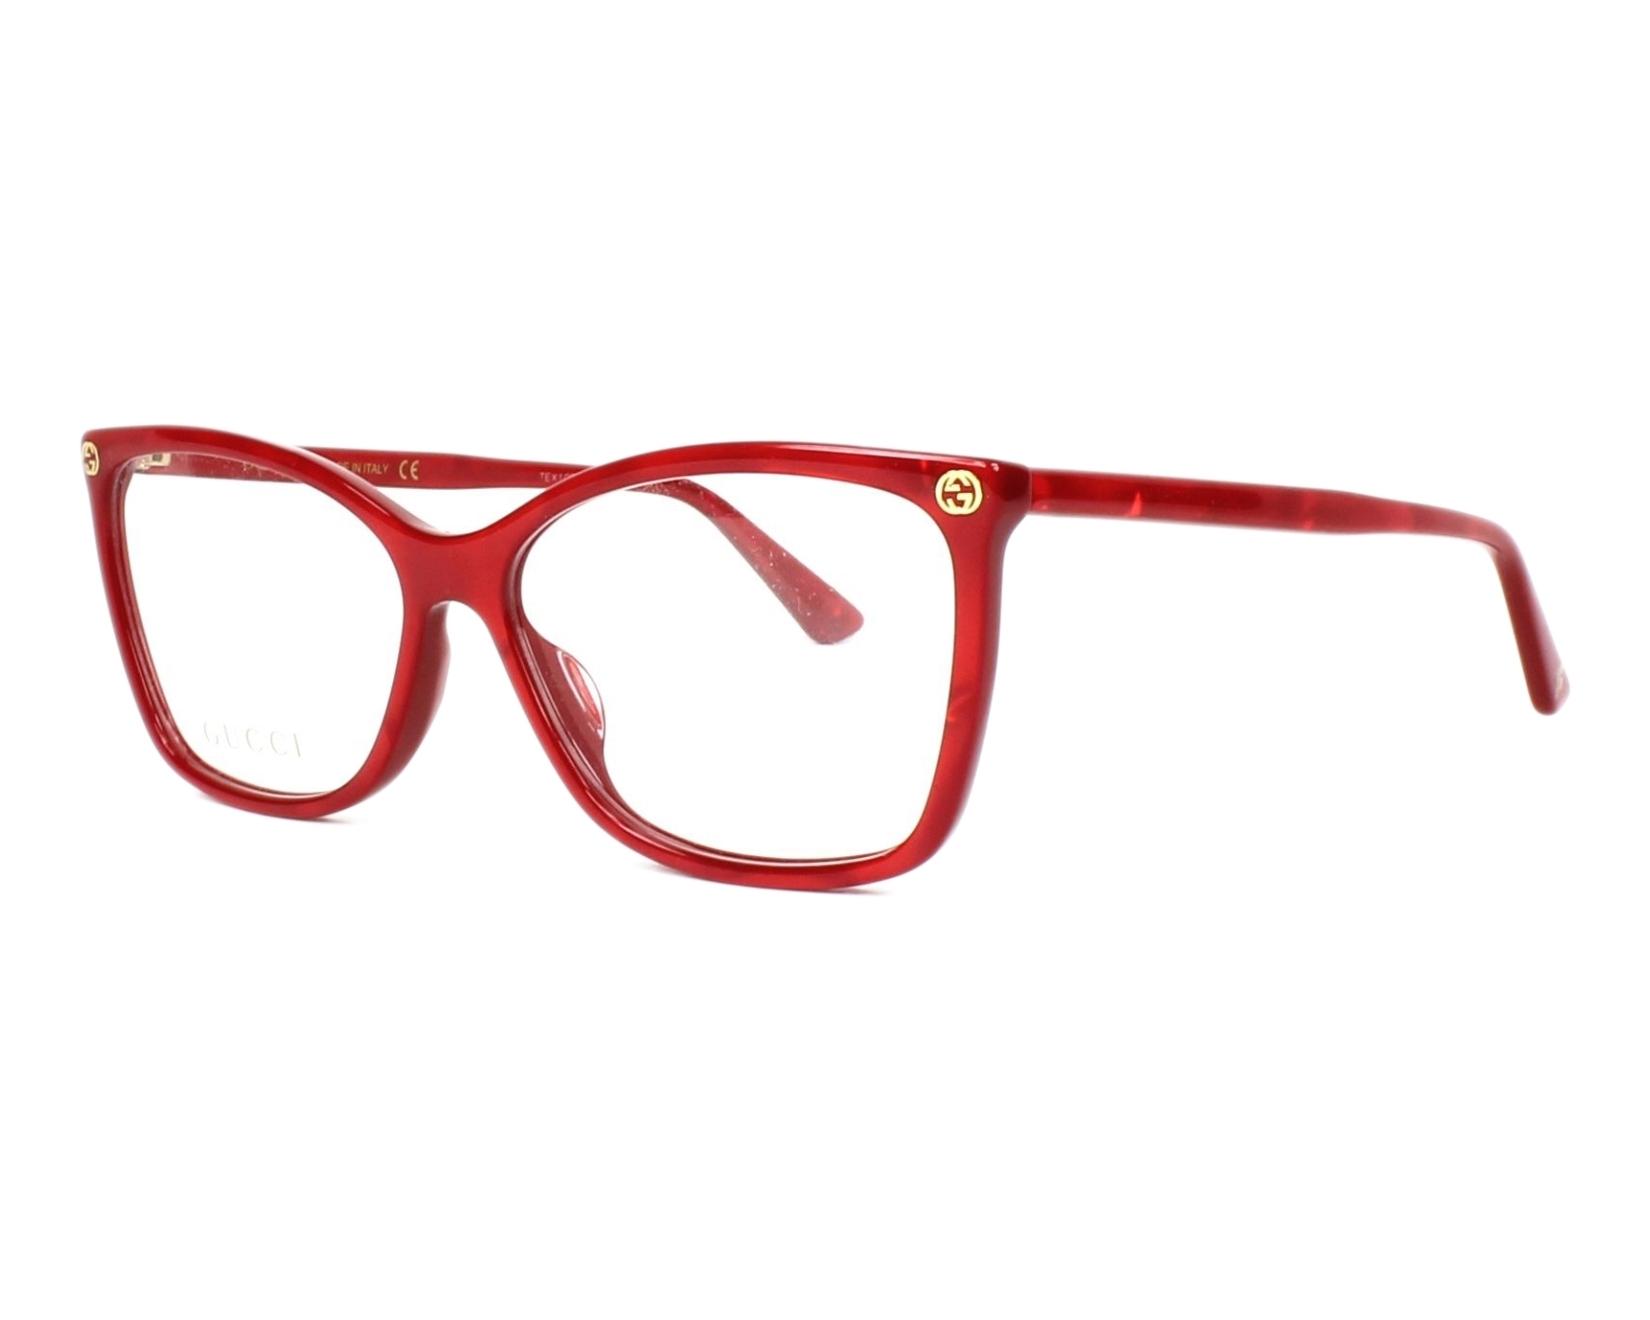 Gucci Eyeglasses GG-00250 004 Red - Visionet UK